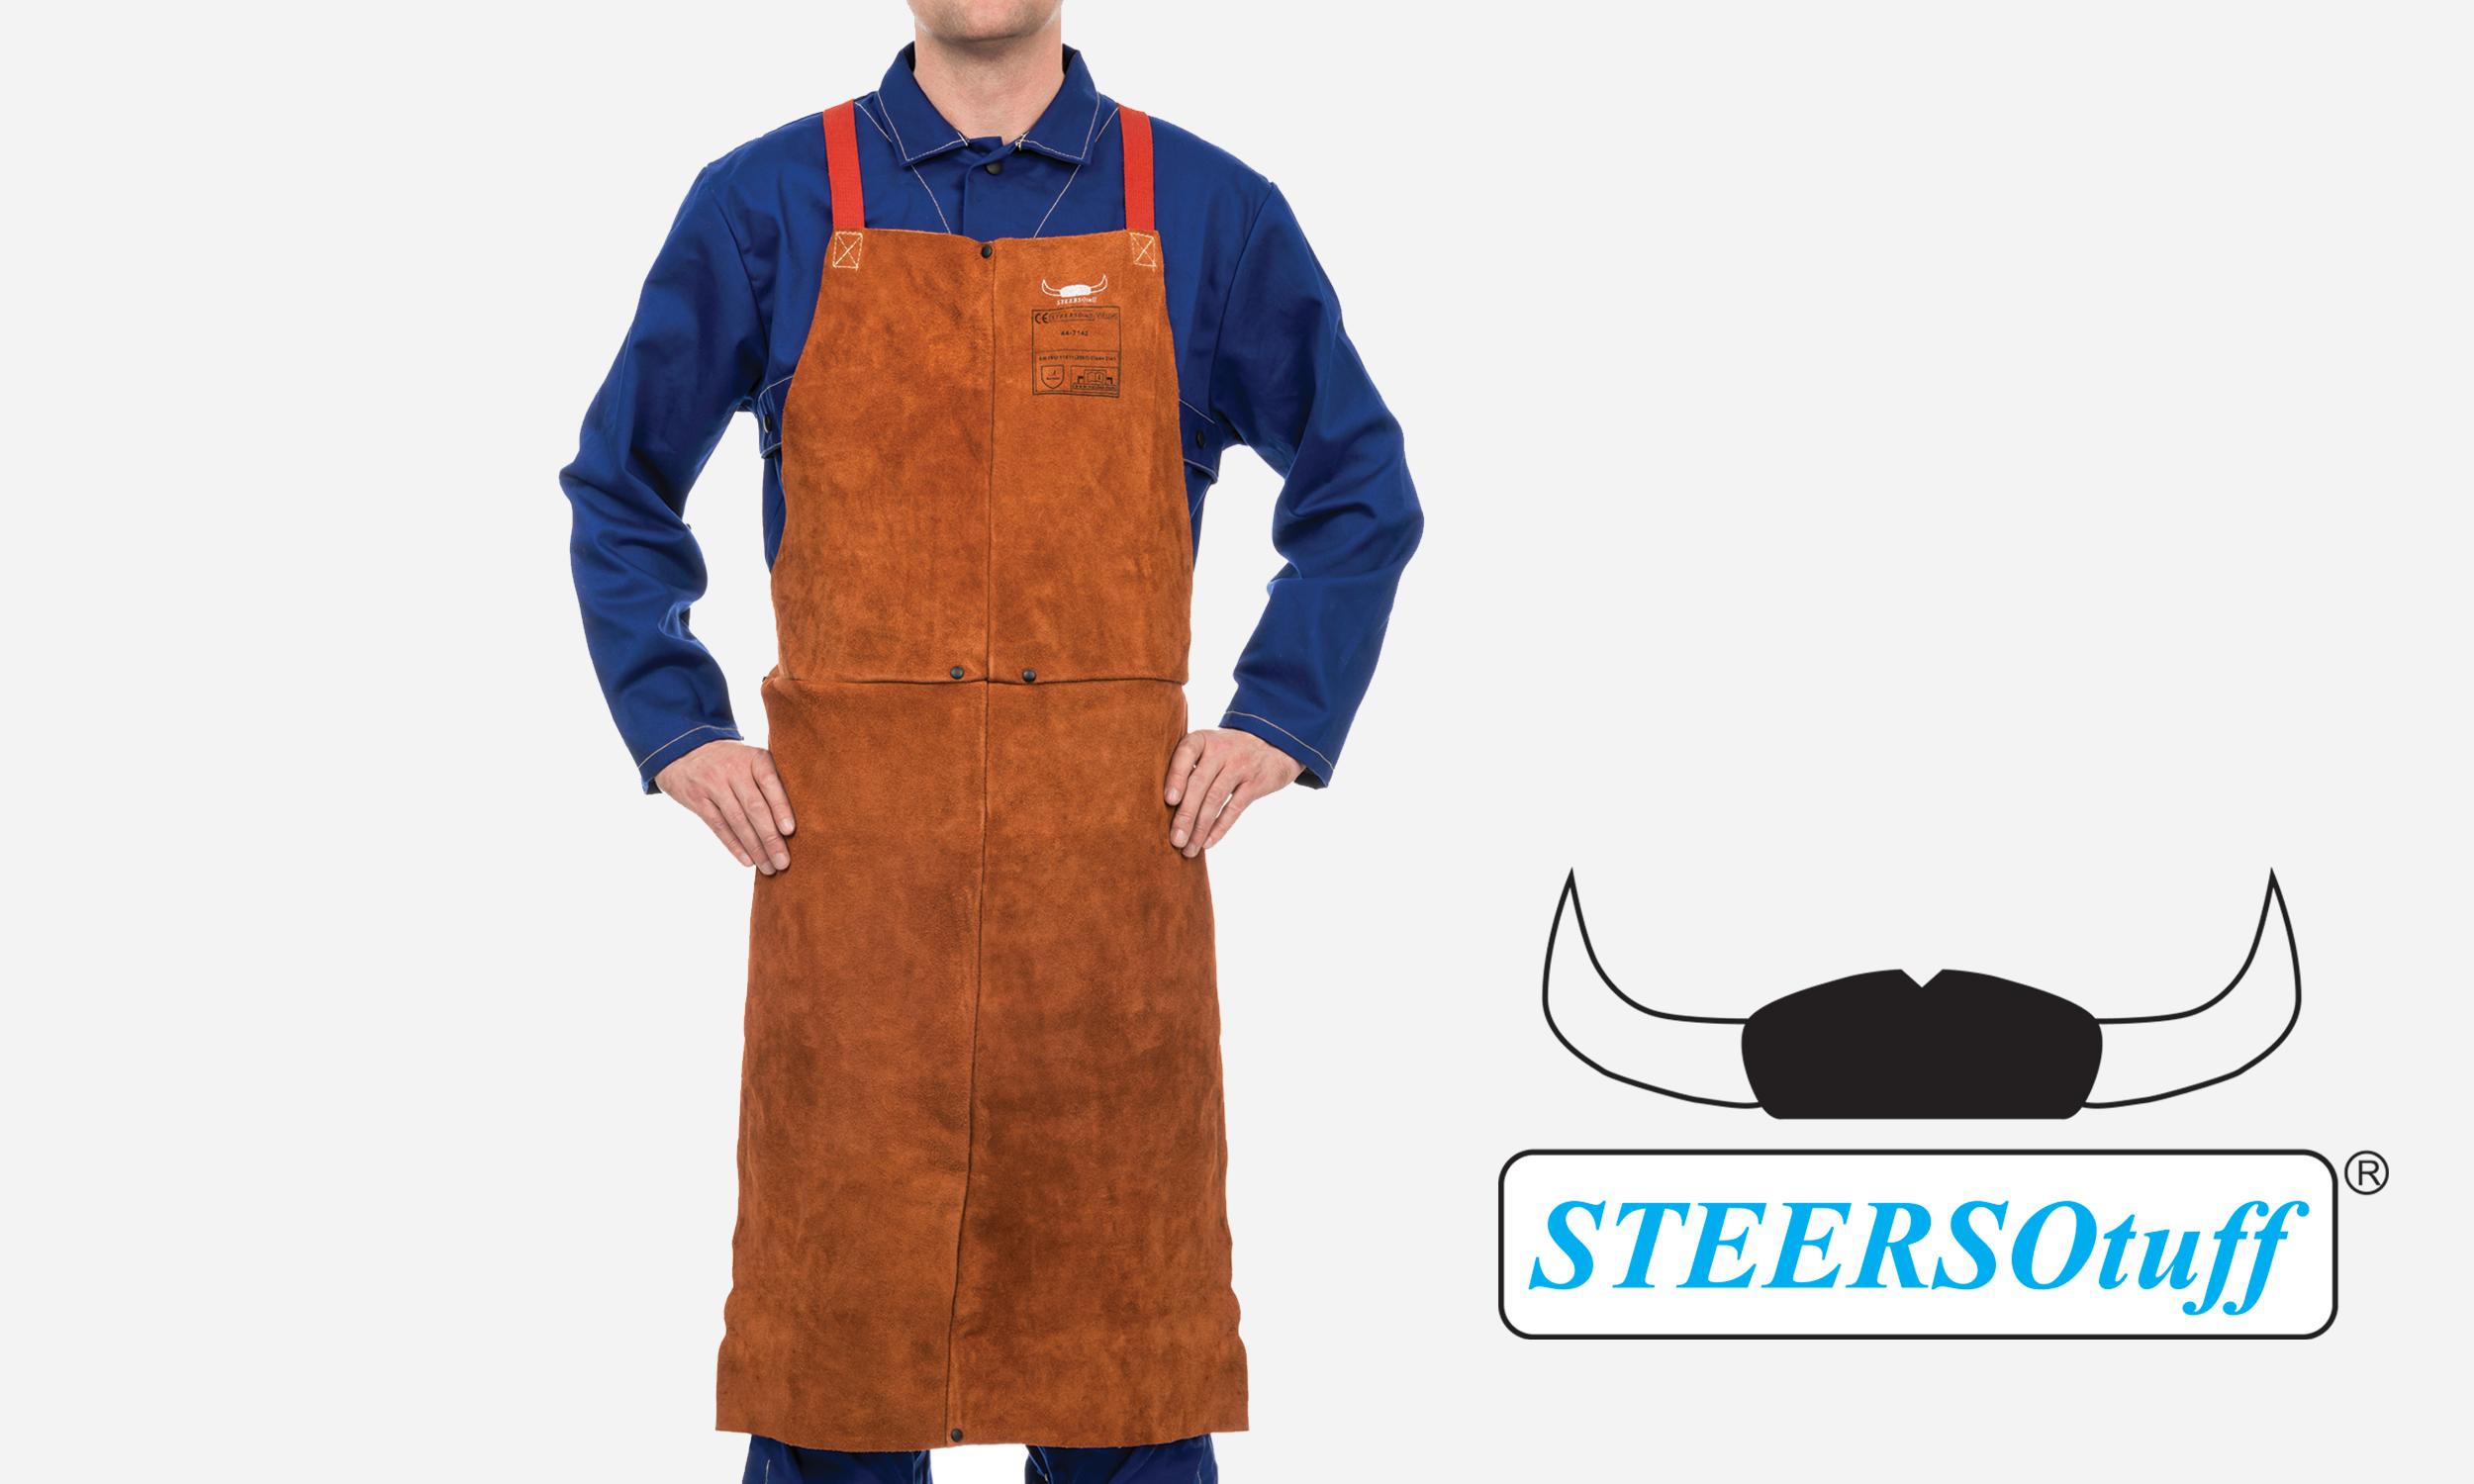 44-7136, 44-7142, 44-7148 Premium Leather Bib Apron.png